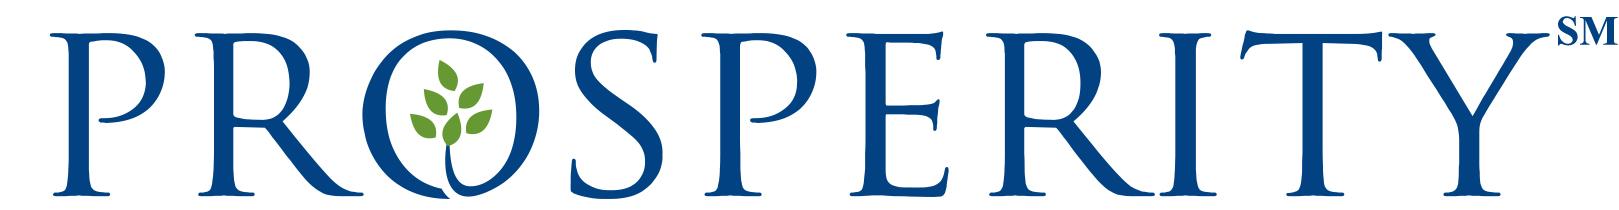 Prosperity Life Logo-Blue cropped-SM